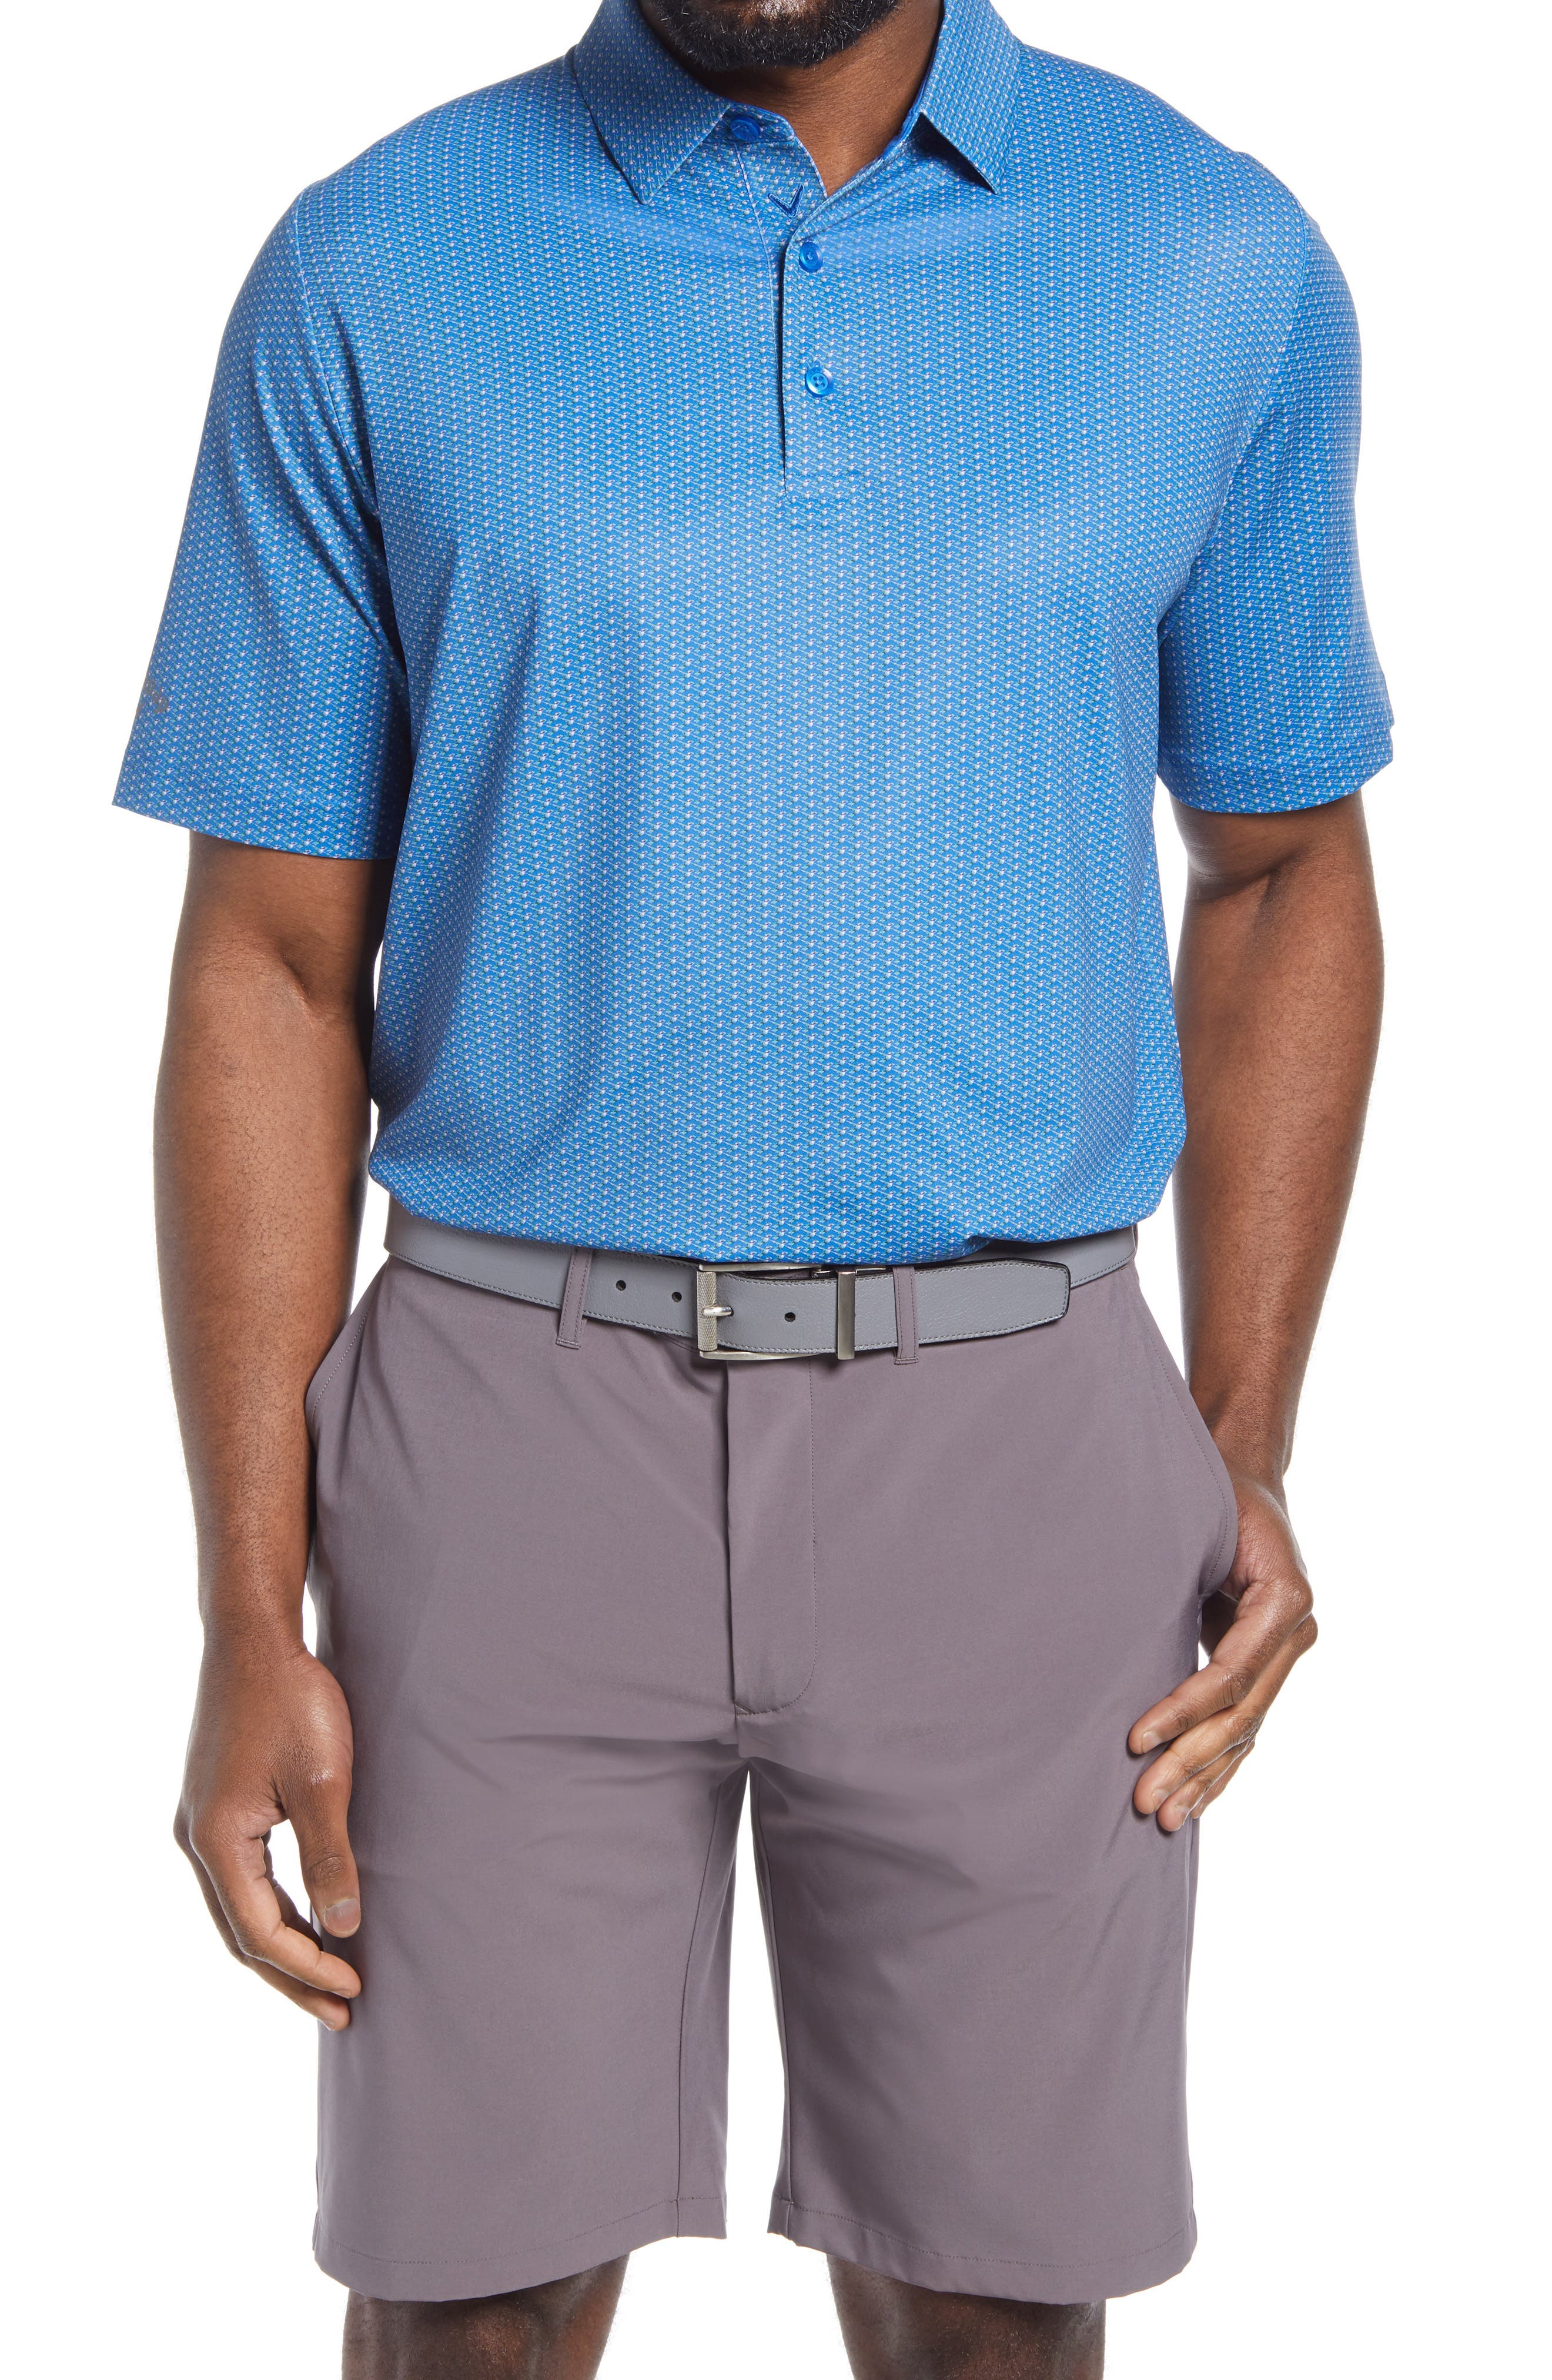 Men's Callaway Golf Swing Tech(TM) Neat Performance Golf Polo